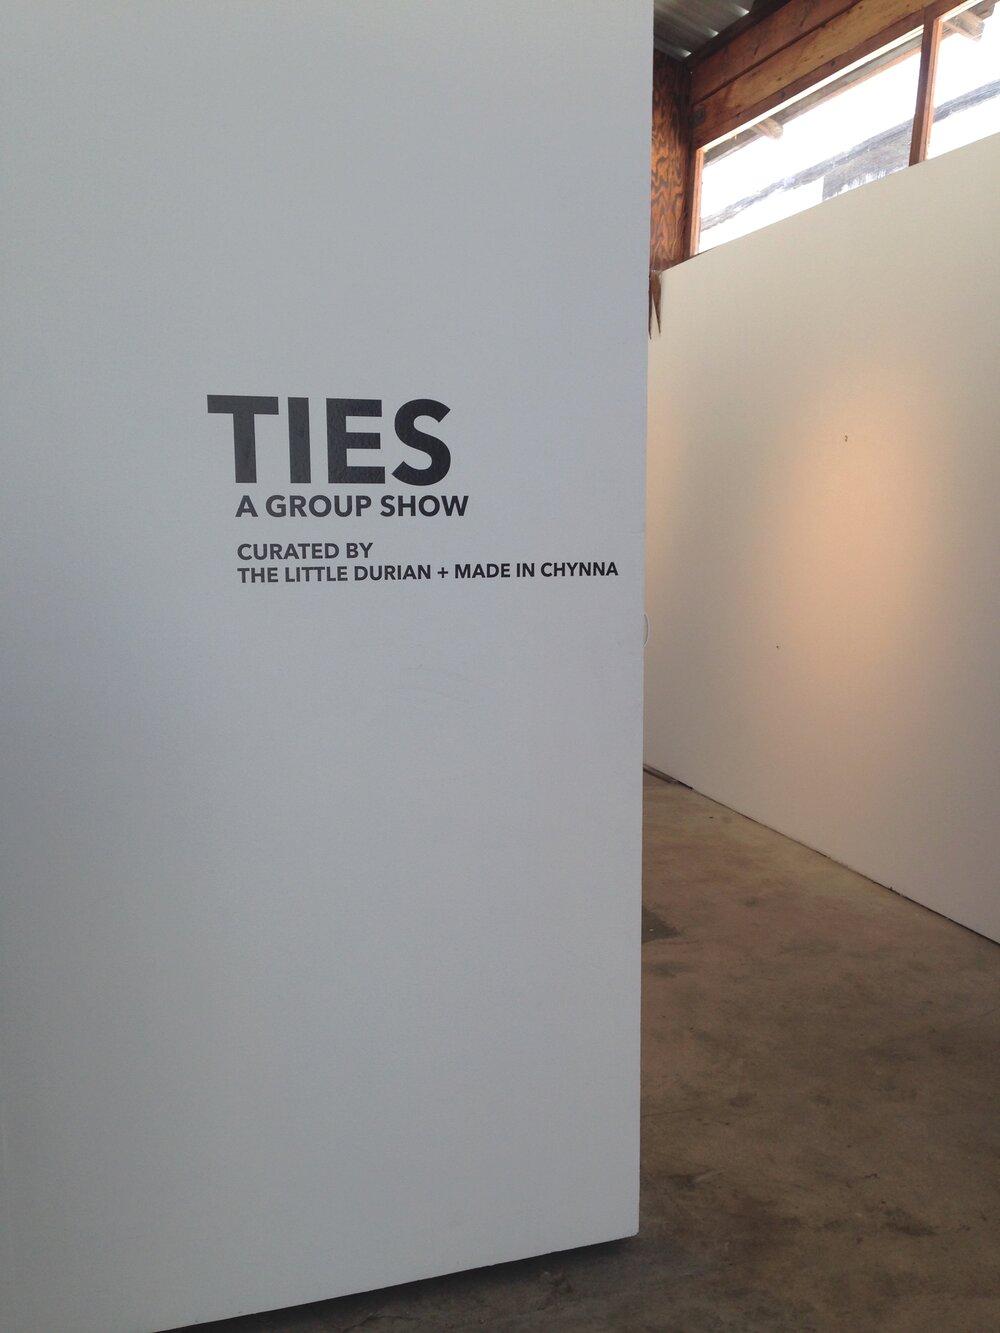 TIES GROUP SHOW